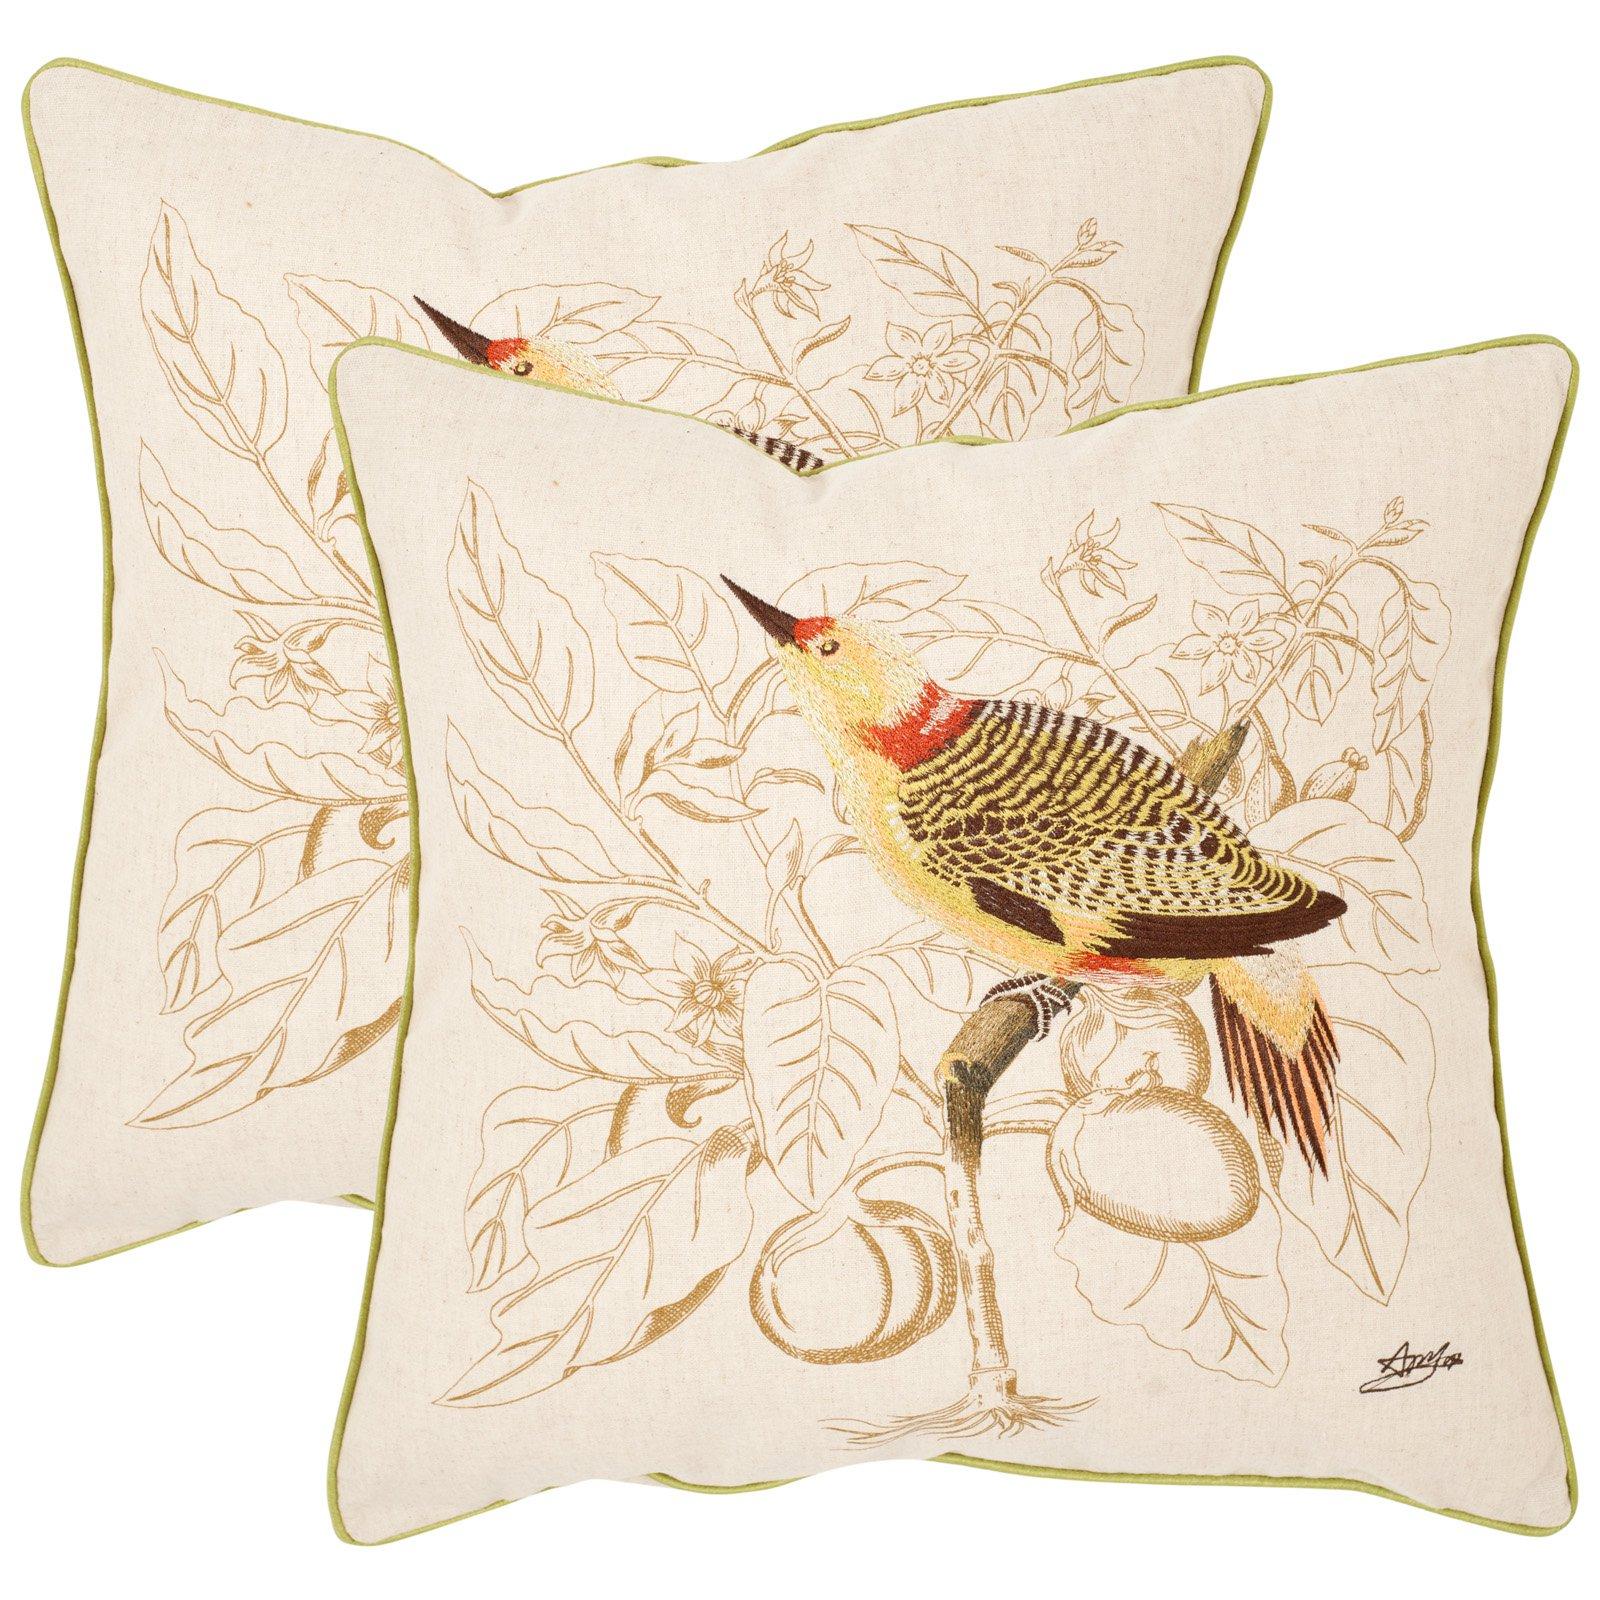 Safavieh Esty Decorative Pillows - Set of 2